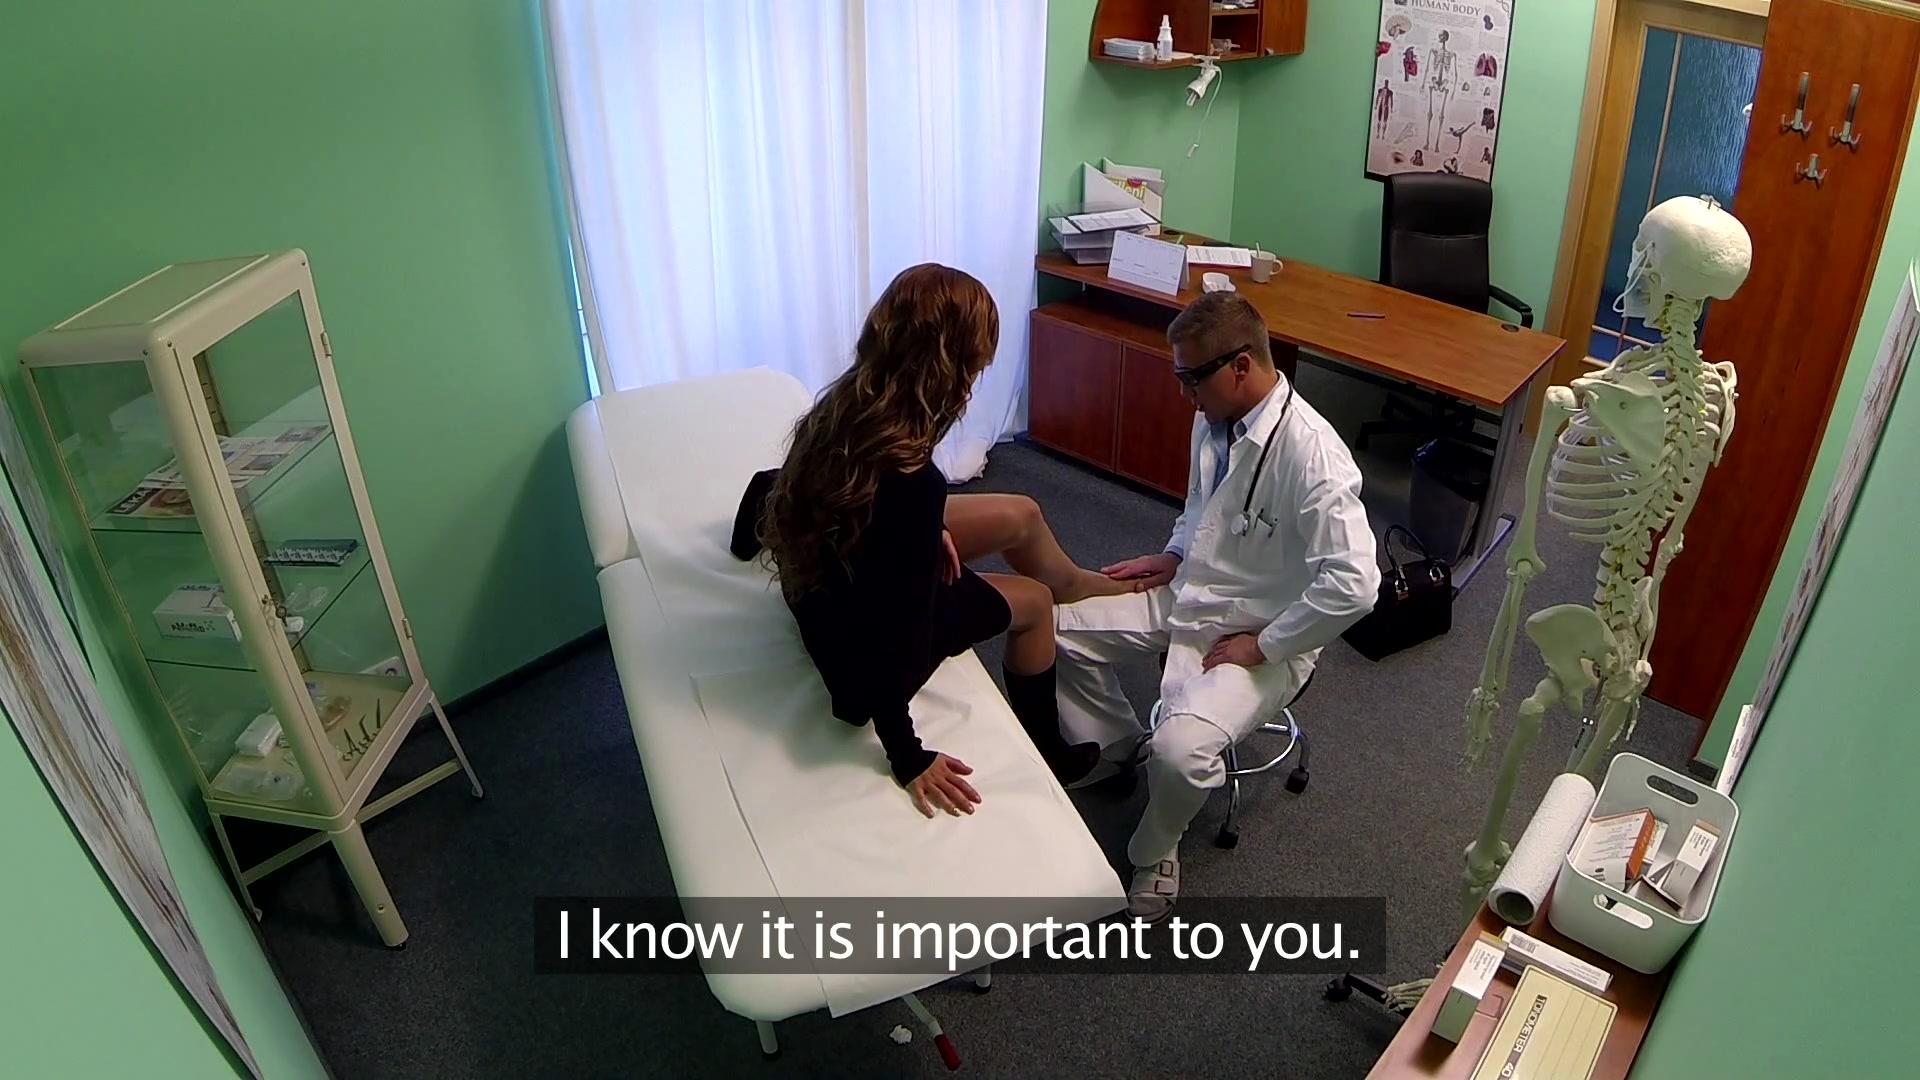 Смотреть порно онлайн фейк хоспитал, Fake Hospital - видео онлайн 21 фотография